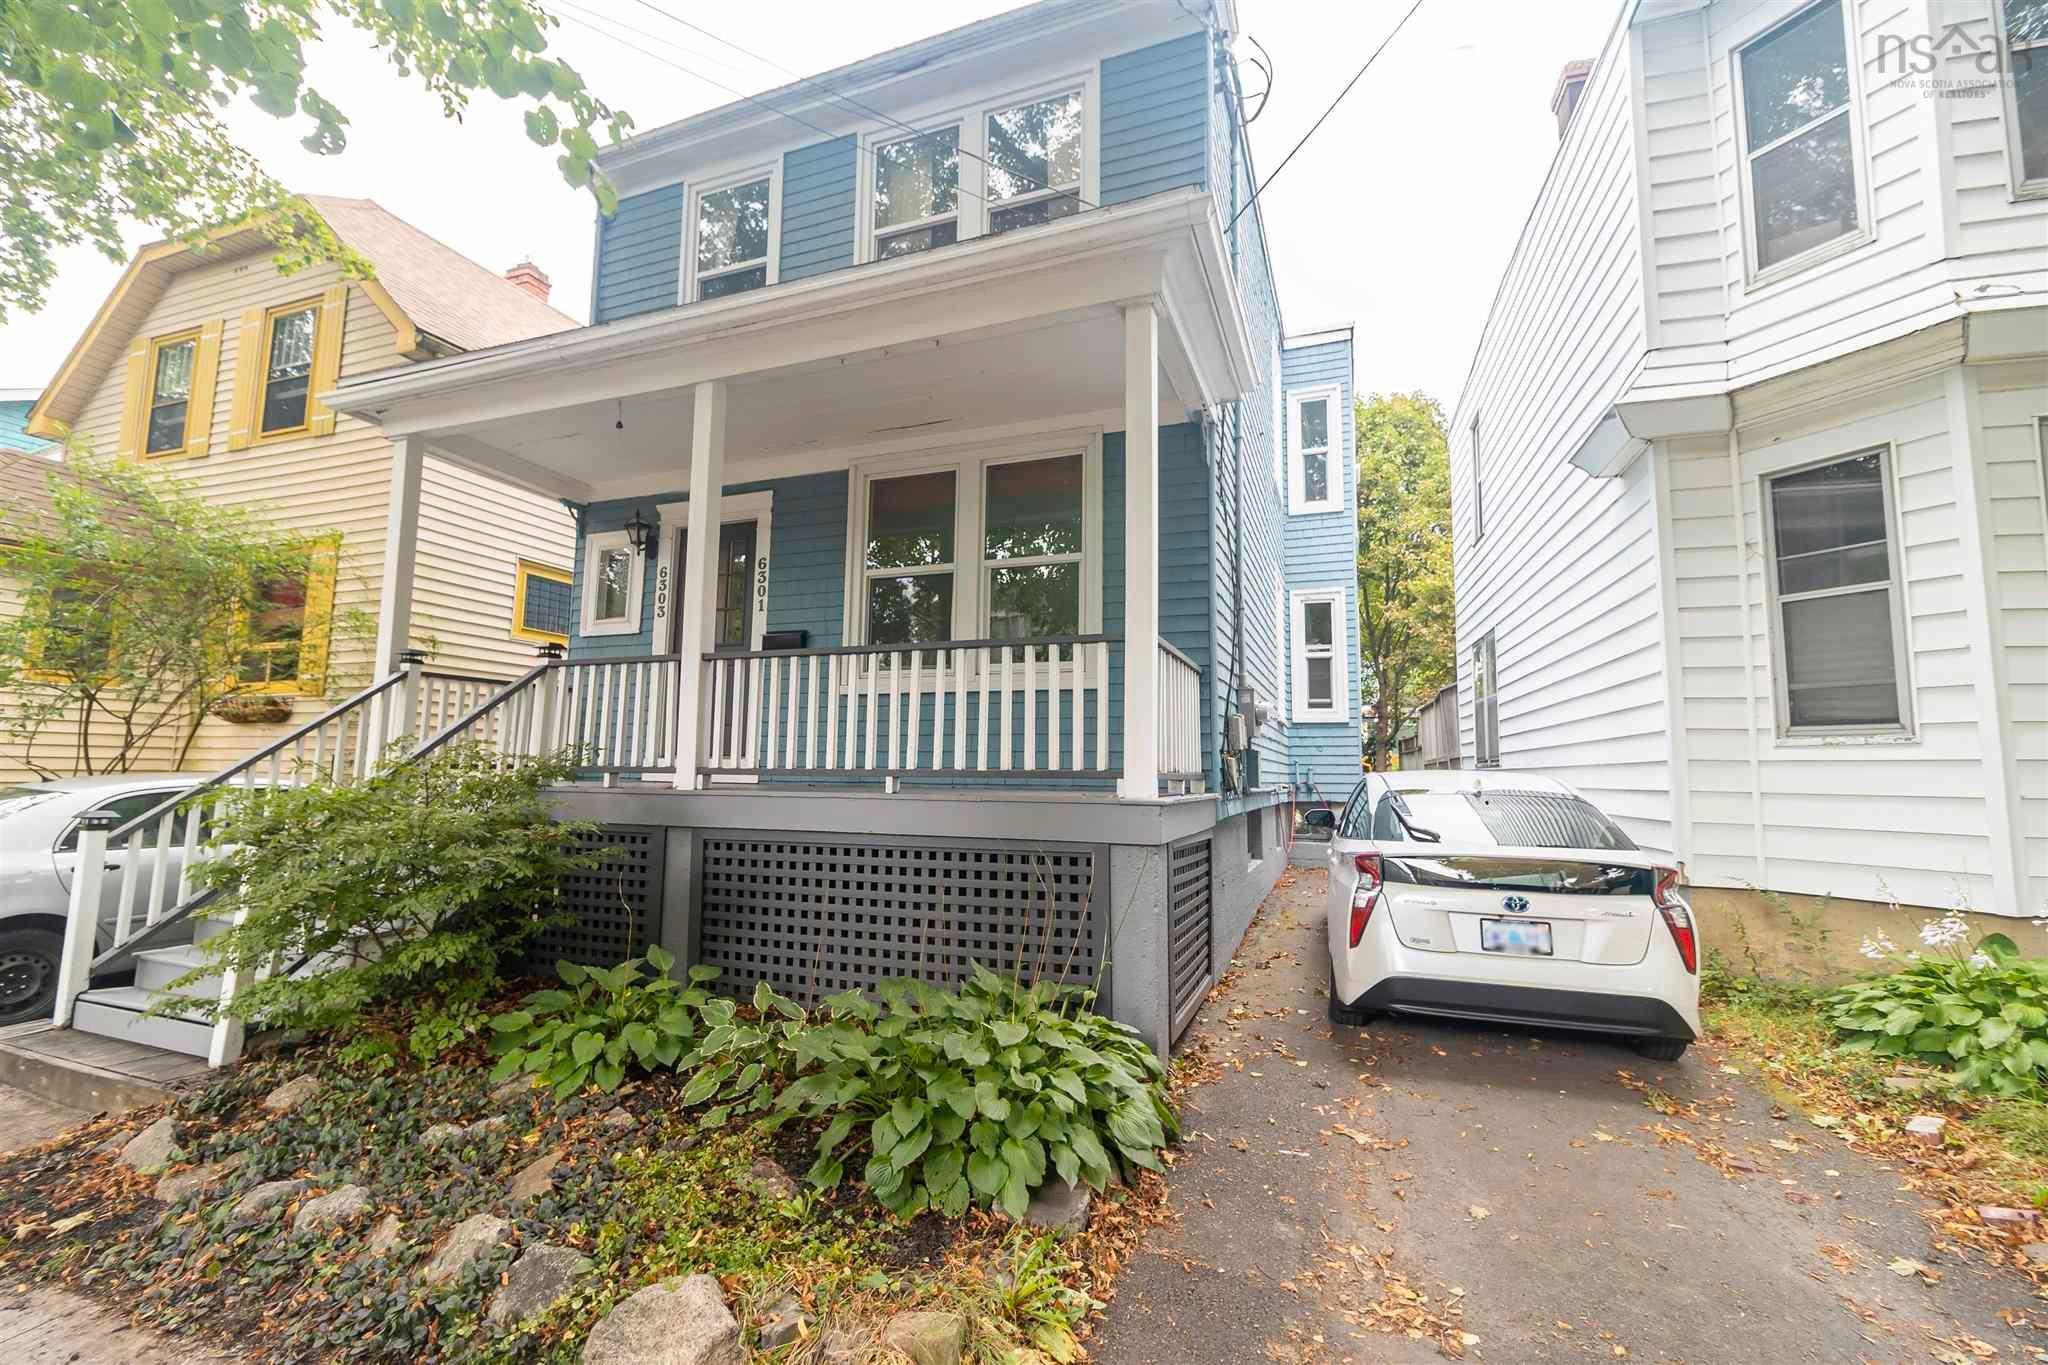 Main Photo: 6301 6303 Allan Street in Halifax: 4-Halifax West Multi-Family for sale (Halifax-Dartmouth)  : MLS®# 202122955